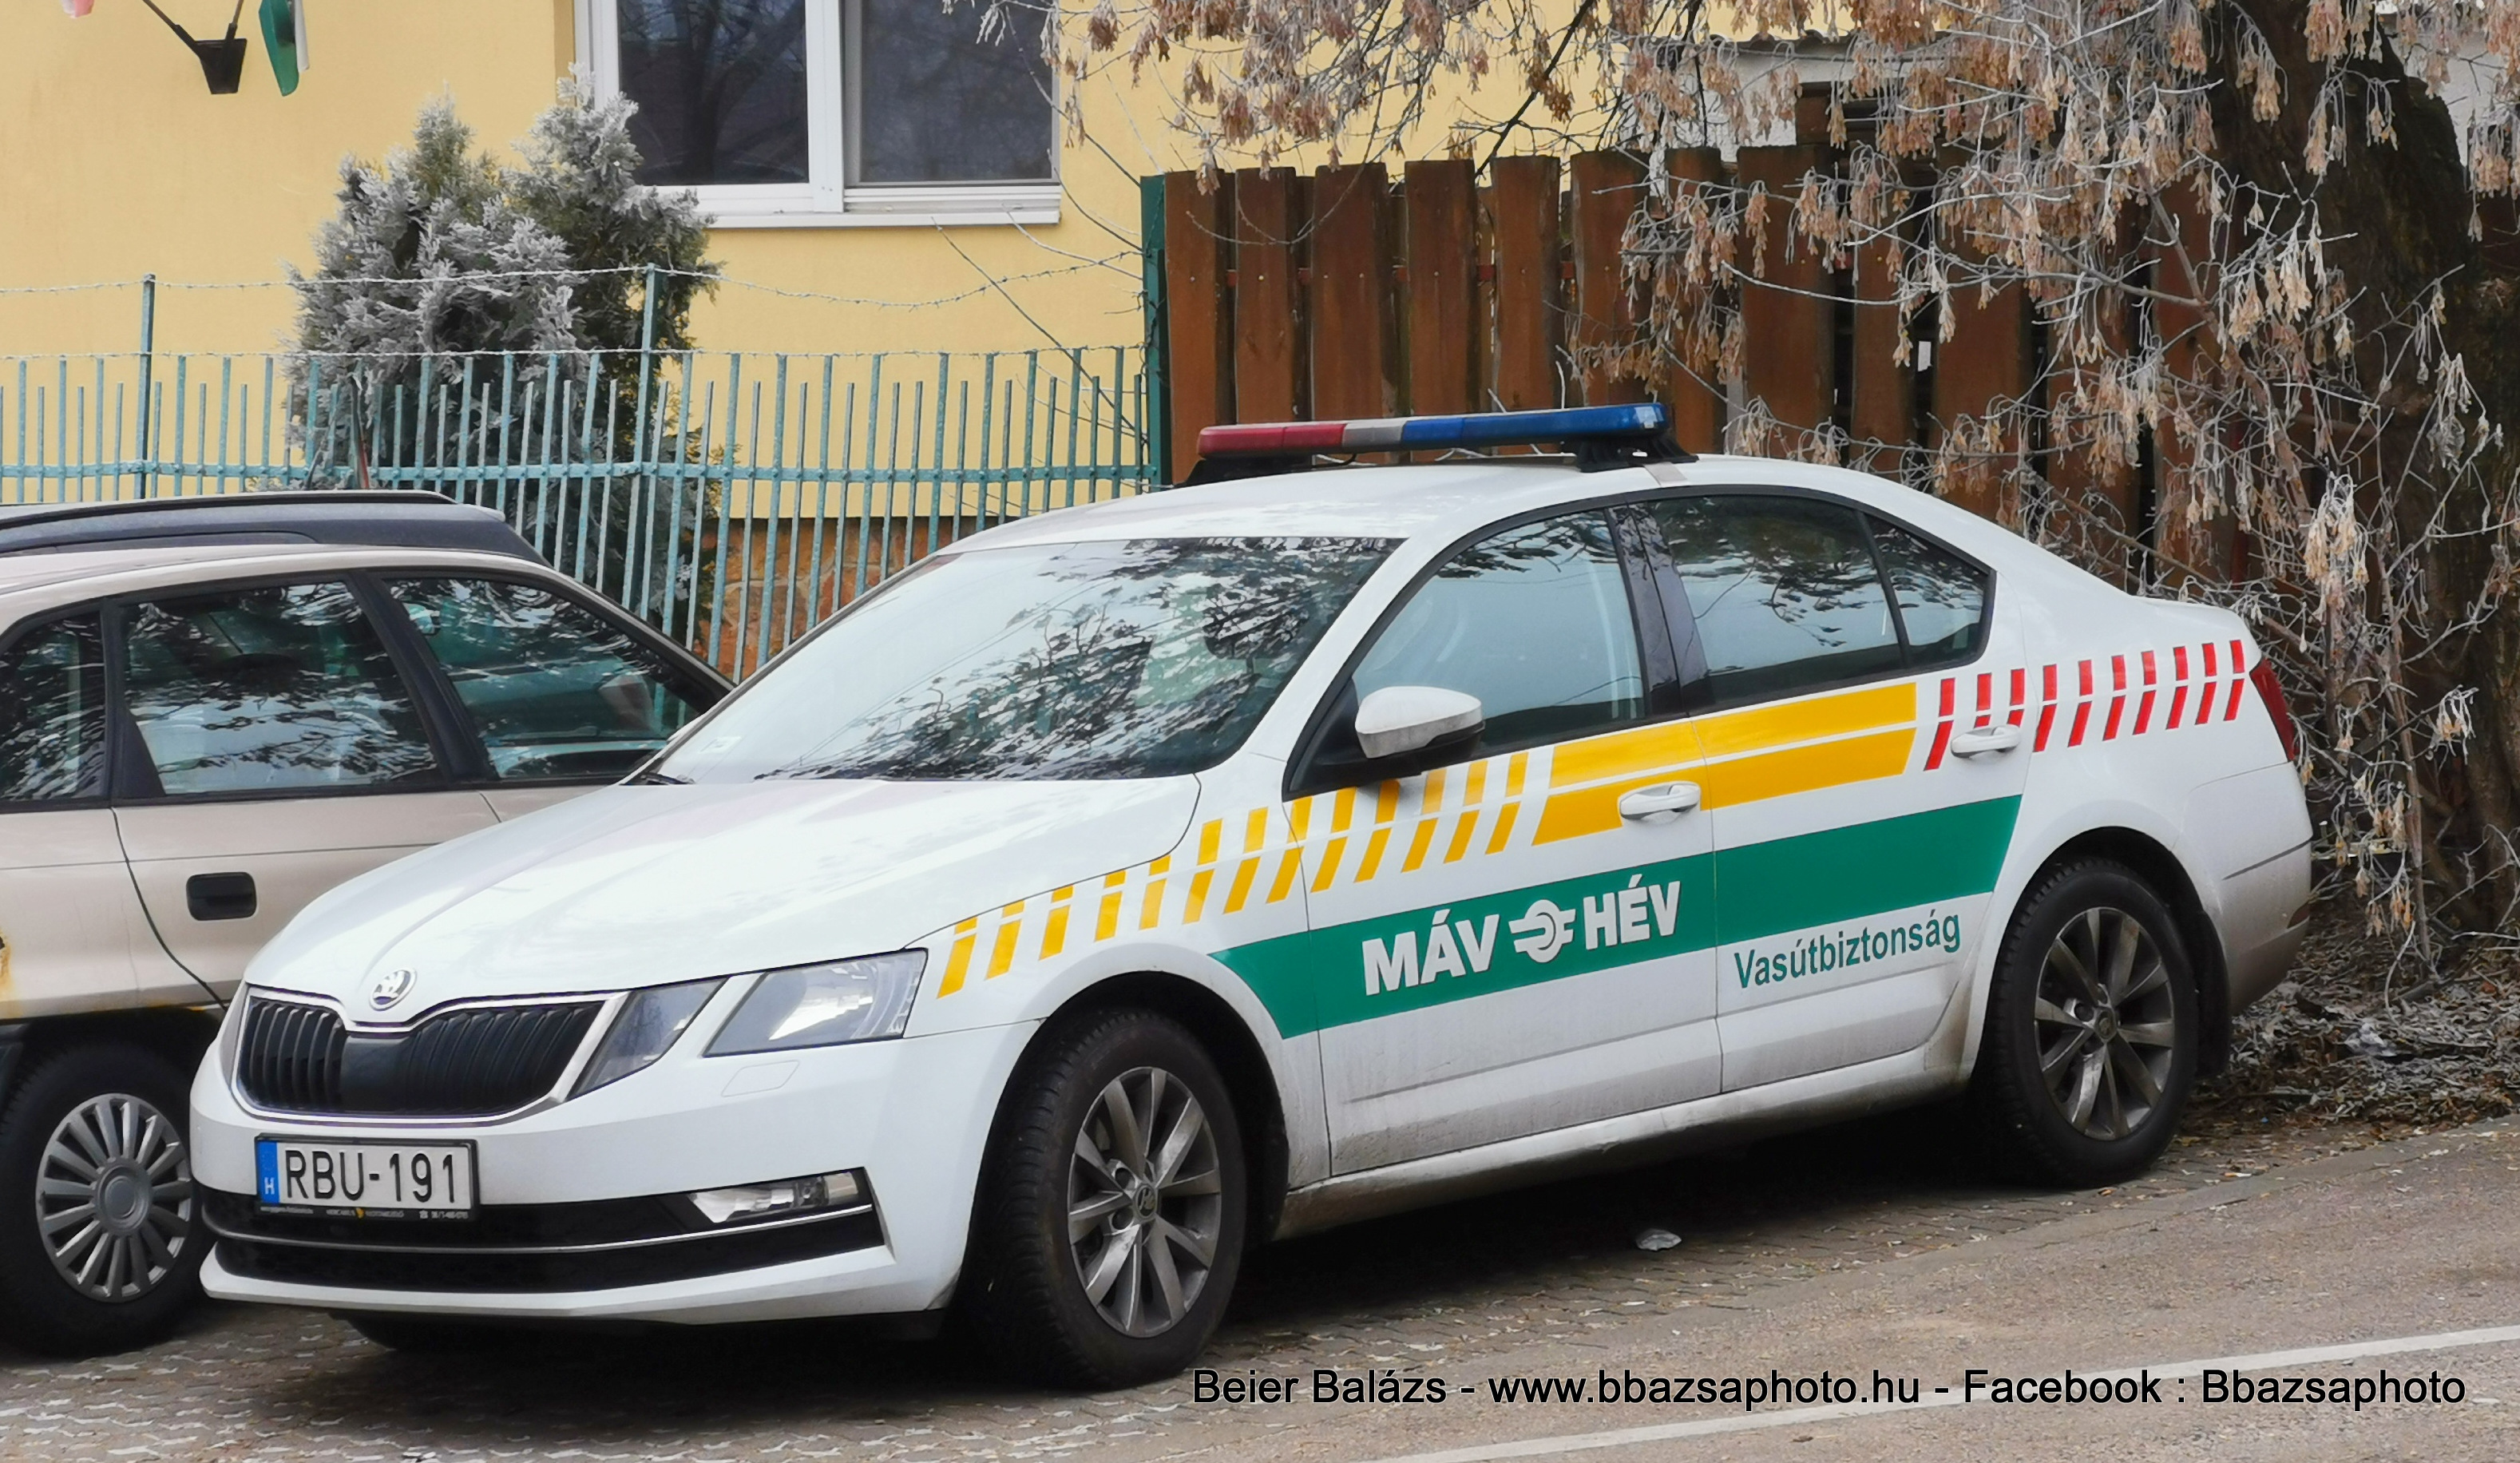 Skoda Octavia III facelift – MÁV – HÉV vasútbiztonság